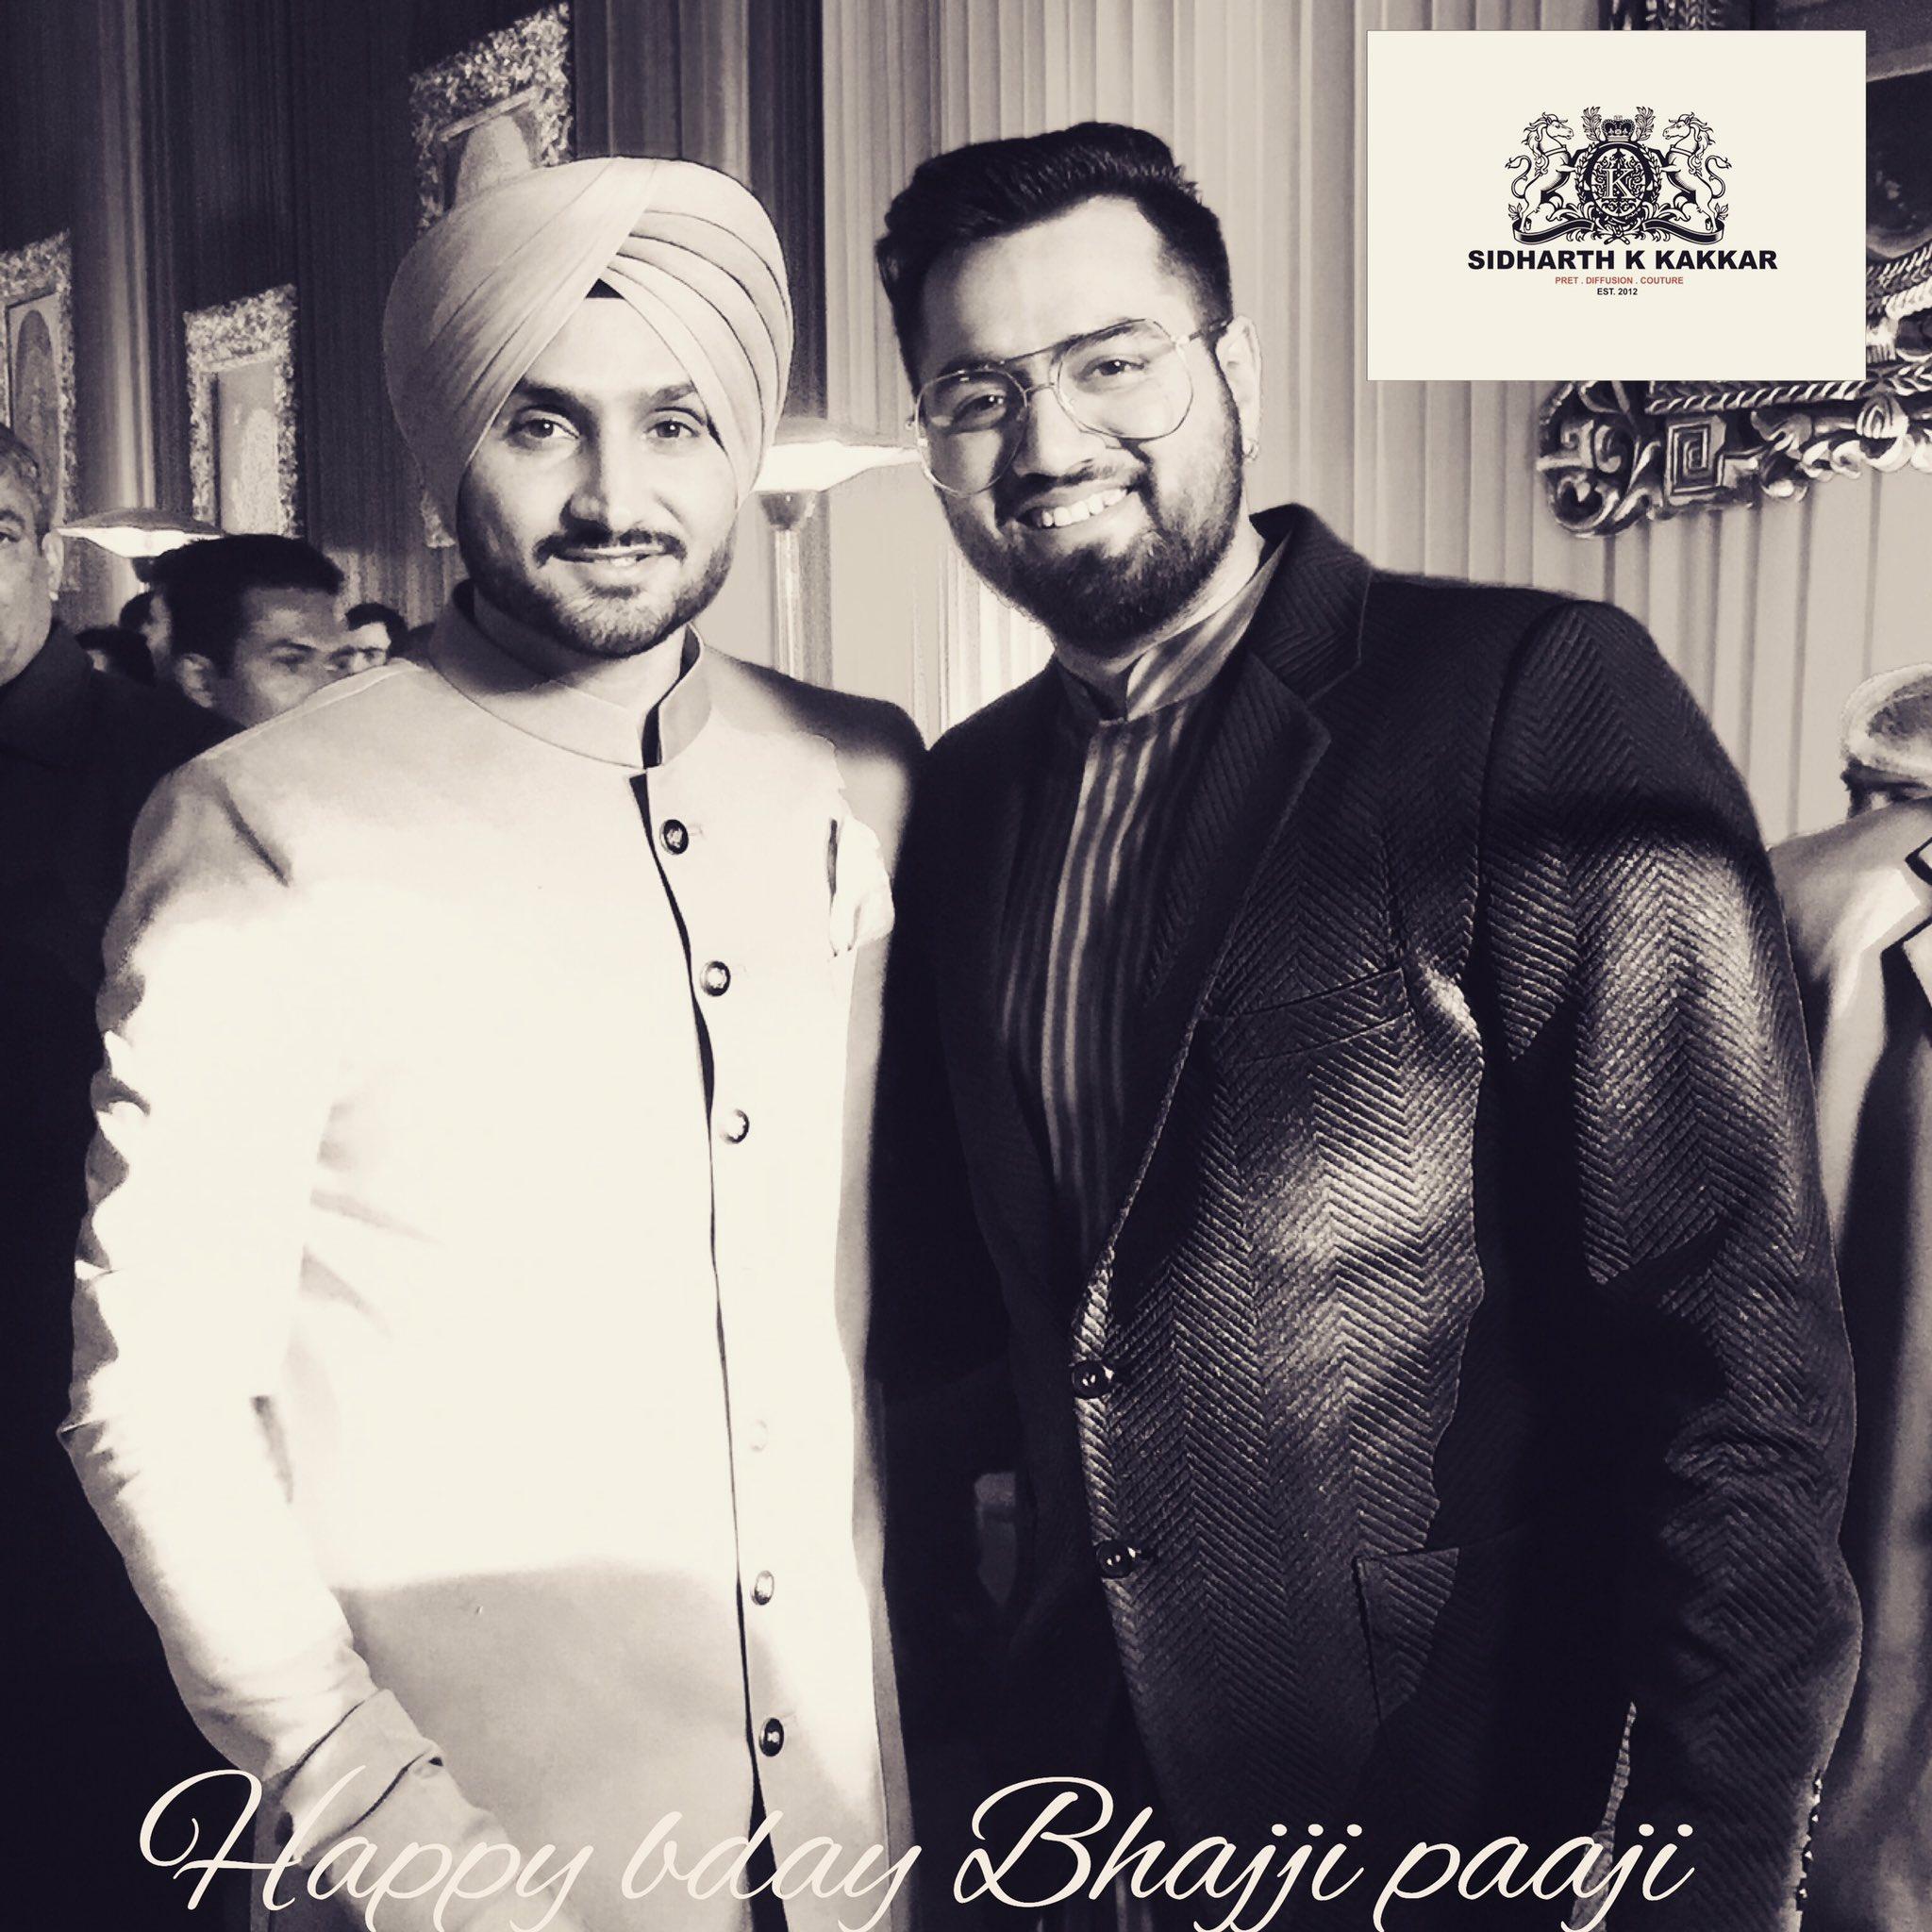 Happy bday paaji !! We love you !!